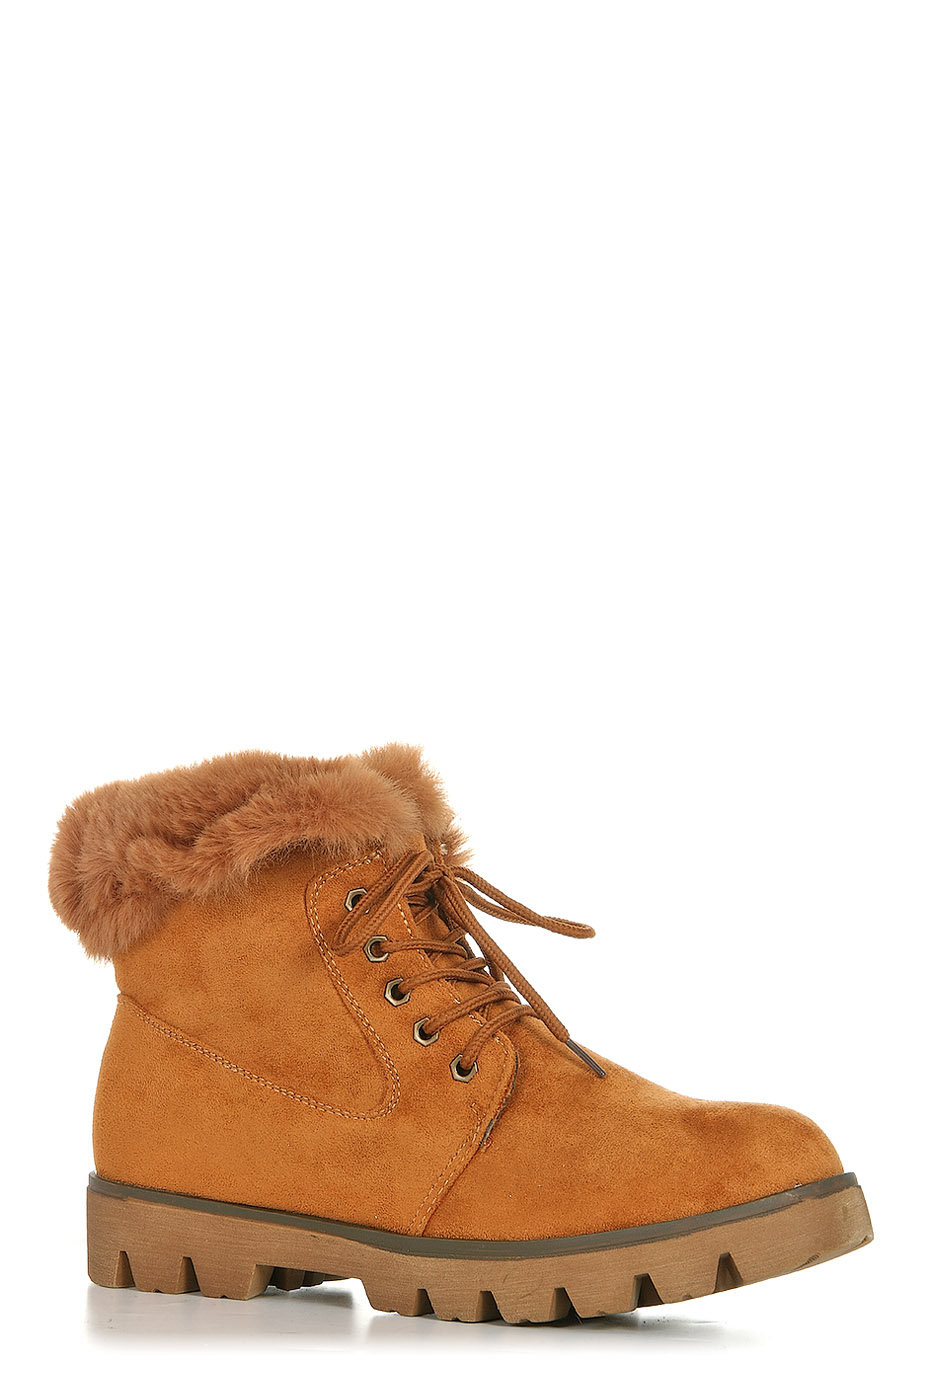 Ботинки TOPLAND2352-PB76163K/CAMEL